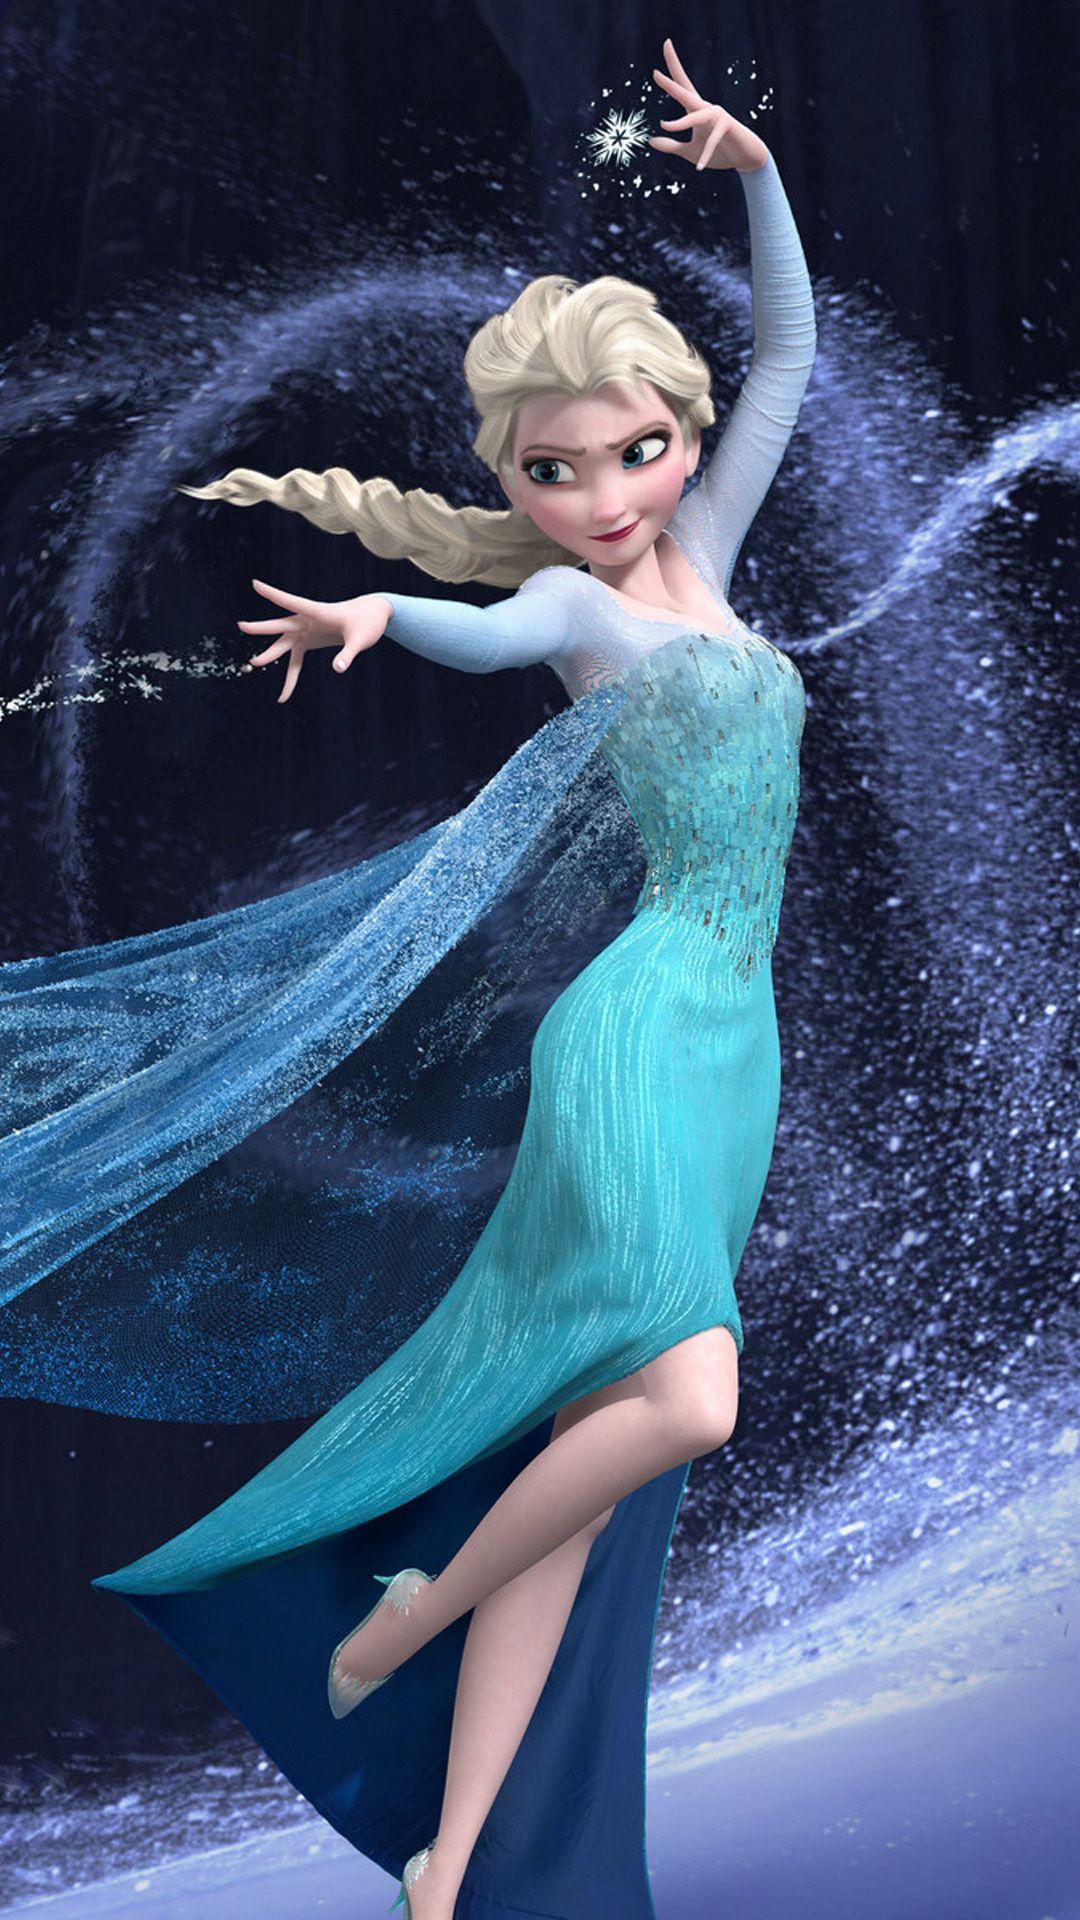 Movies Ice Princess Turquoise Cartoon Frozen Pretty Beautiful Cute Elsa Cold Snow HD IPhone 6 Plus Wallpaper